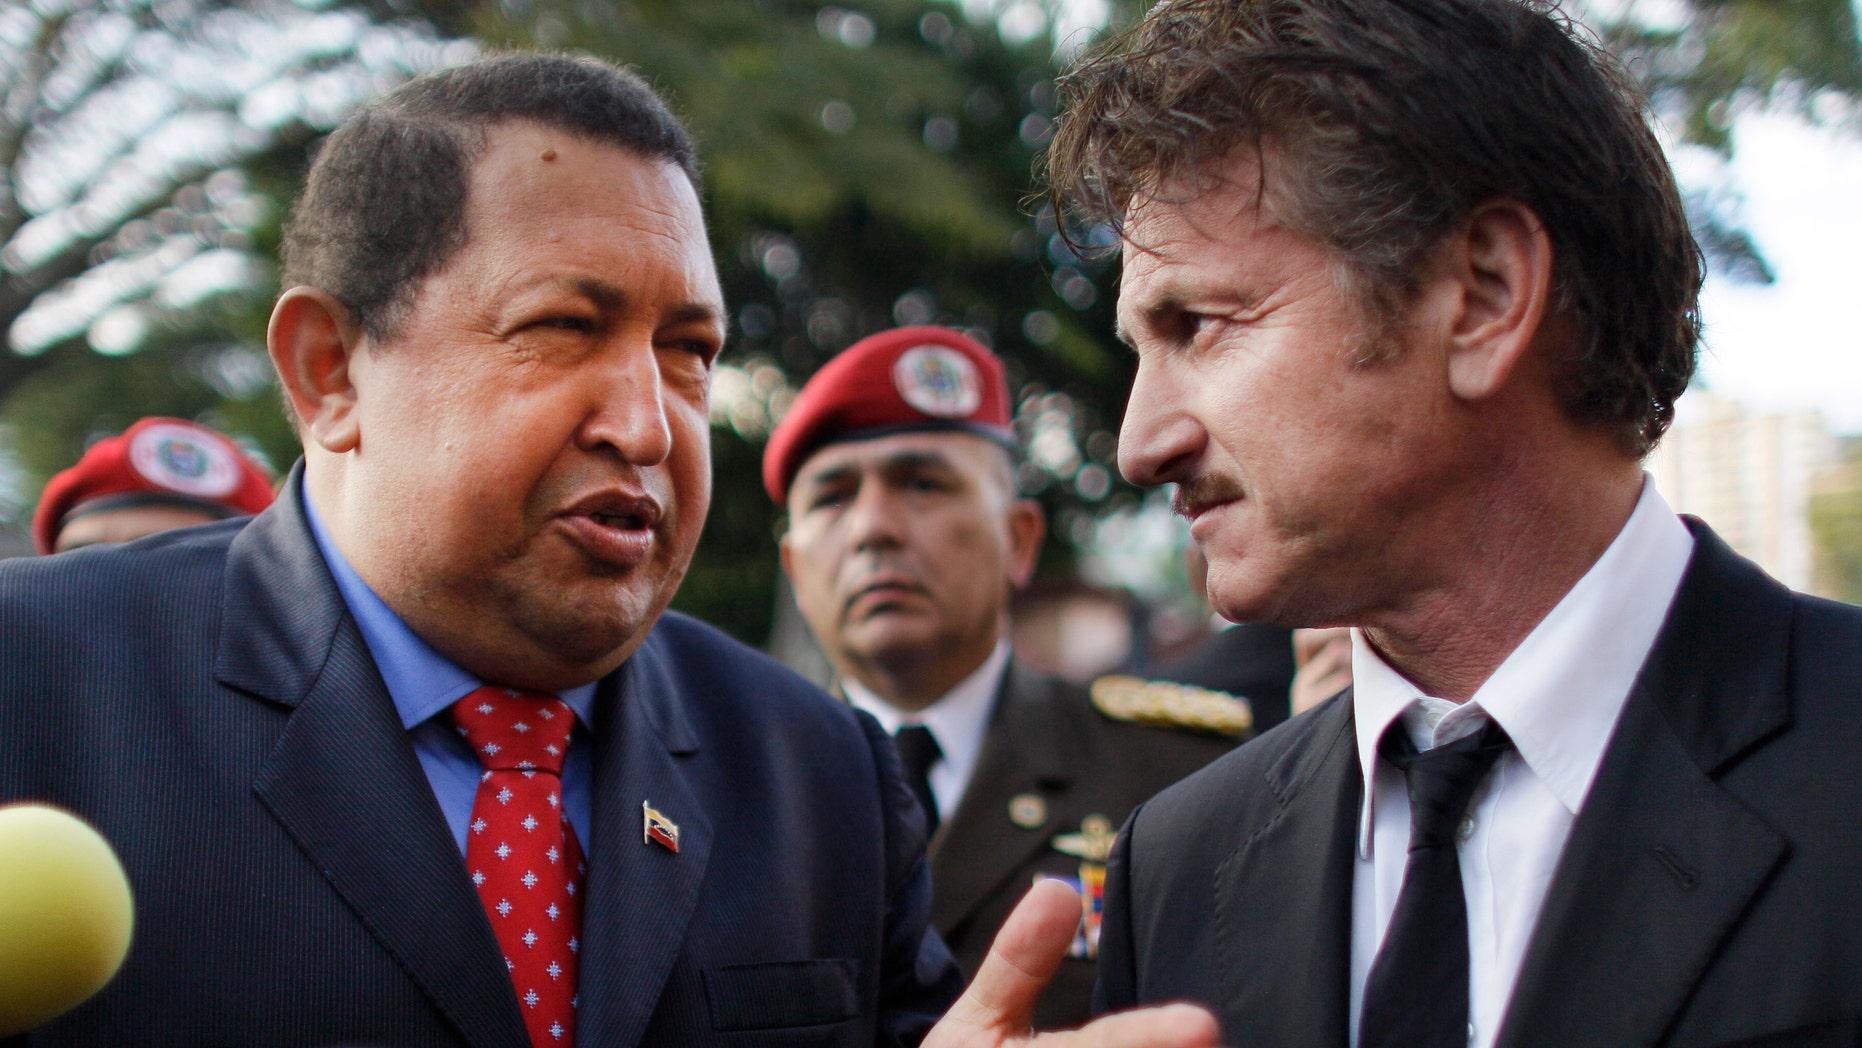 Venezuela's President Hugo Chavez, left, talks to actor Sean Penn, of United States, who visited the presidential palace in Caracas, Venezuela, Thursday, Feb. 16, 2012. (AP Photo/Ariana Cubillos)